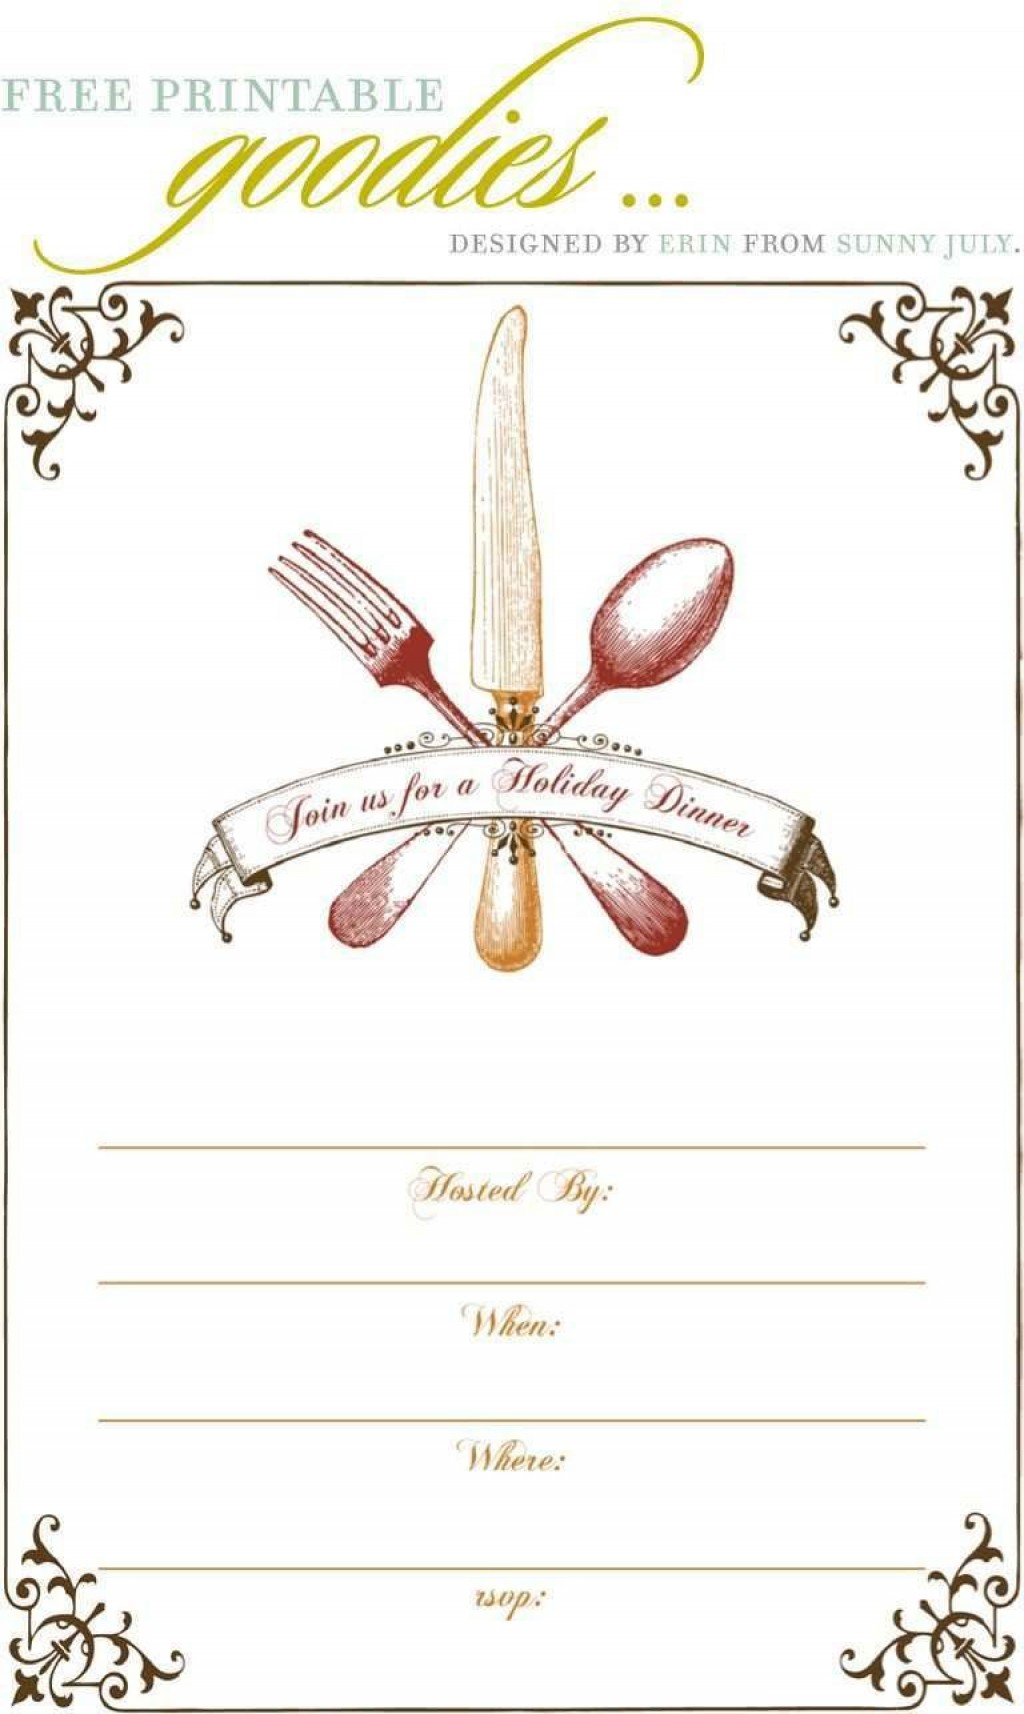 001 Unforgettable Free Dinner Invitation Template Design  Templates Rehearsal Printable Italian ThanksgivingLarge